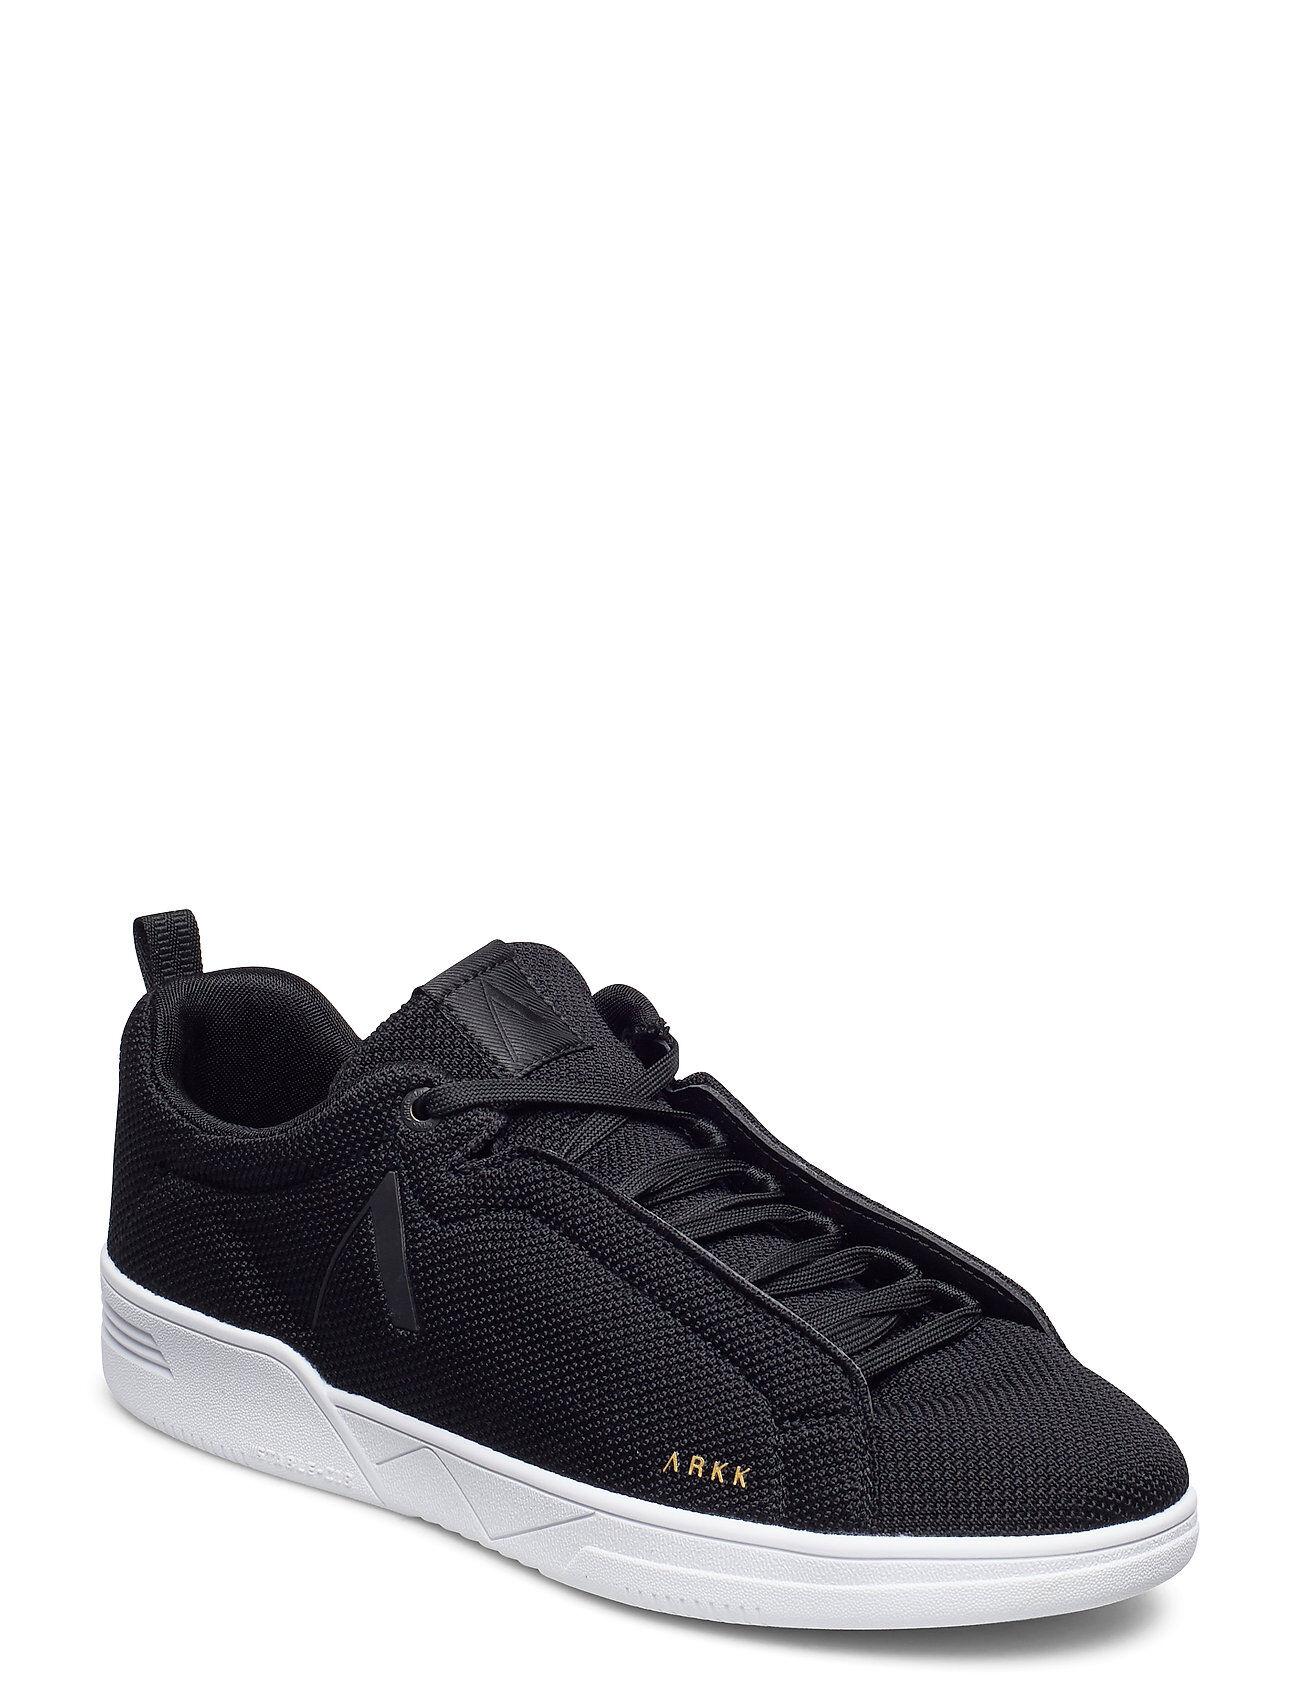 ARKK Copenhagen Uniklass Fg S-C18 Black White - Men Matalavartiset Sneakerit Tennarit Musta ARKK Copenhagen